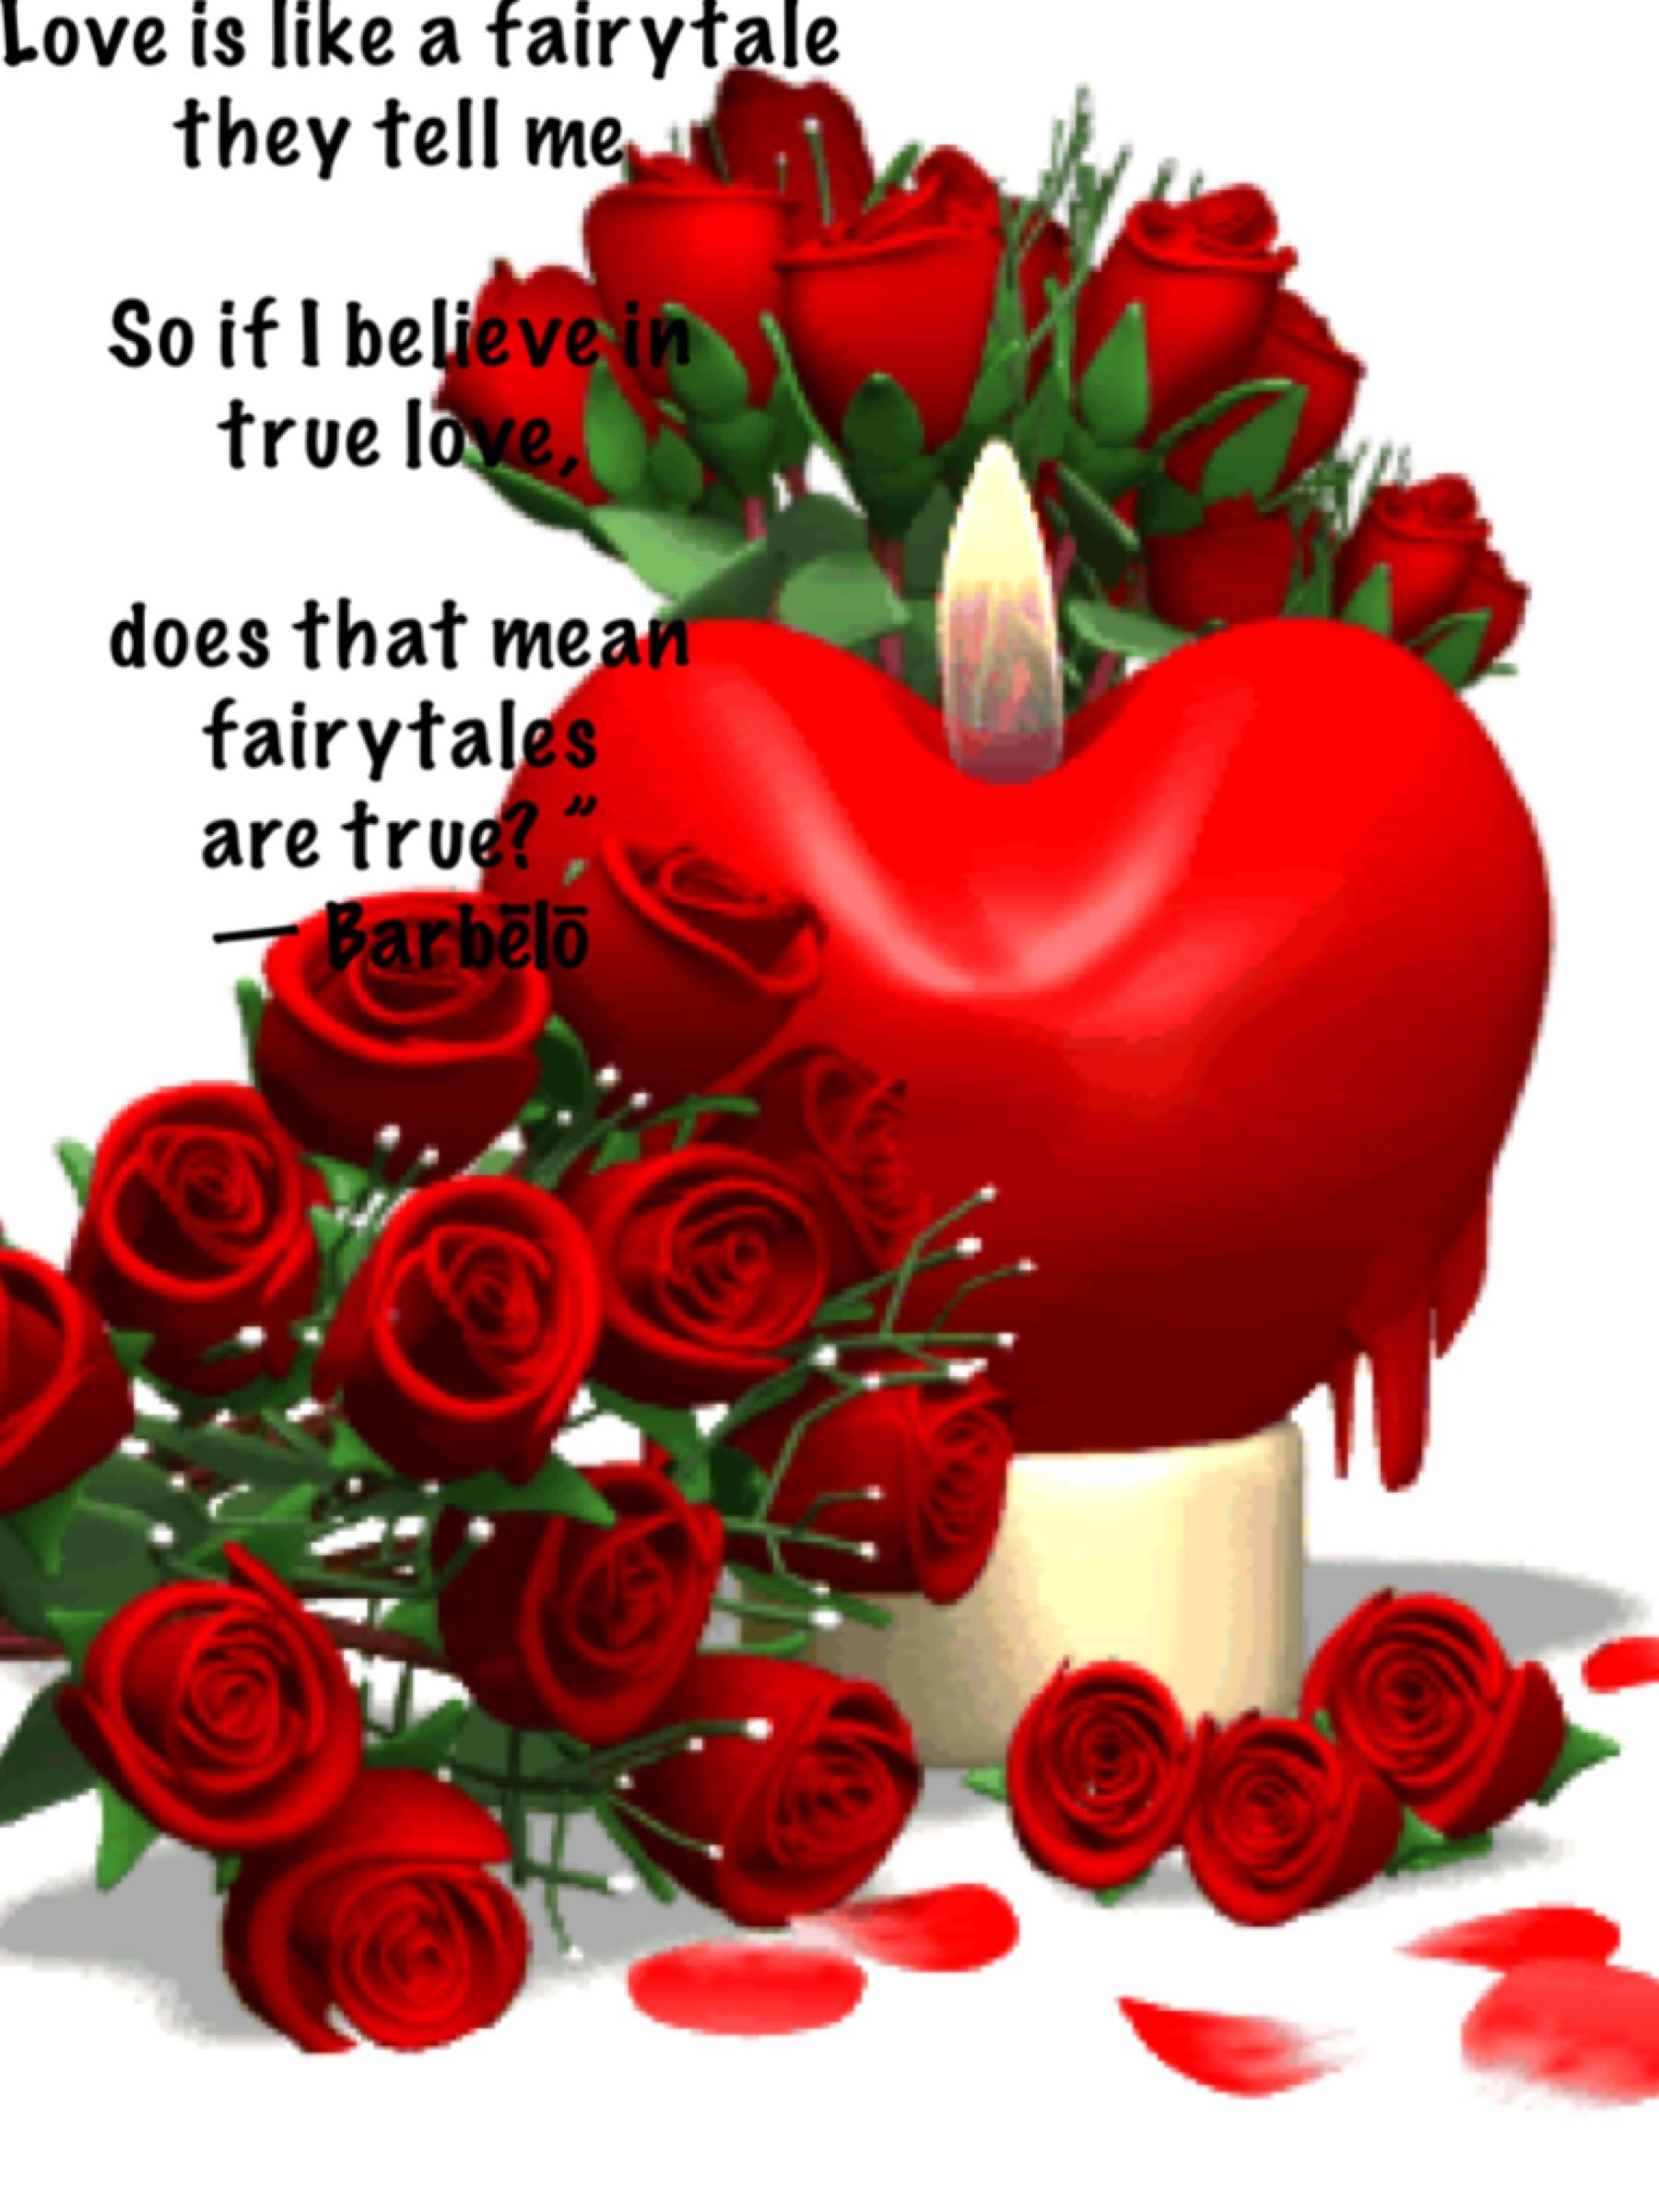 Love Is A Fairytale Hearts Pinterest